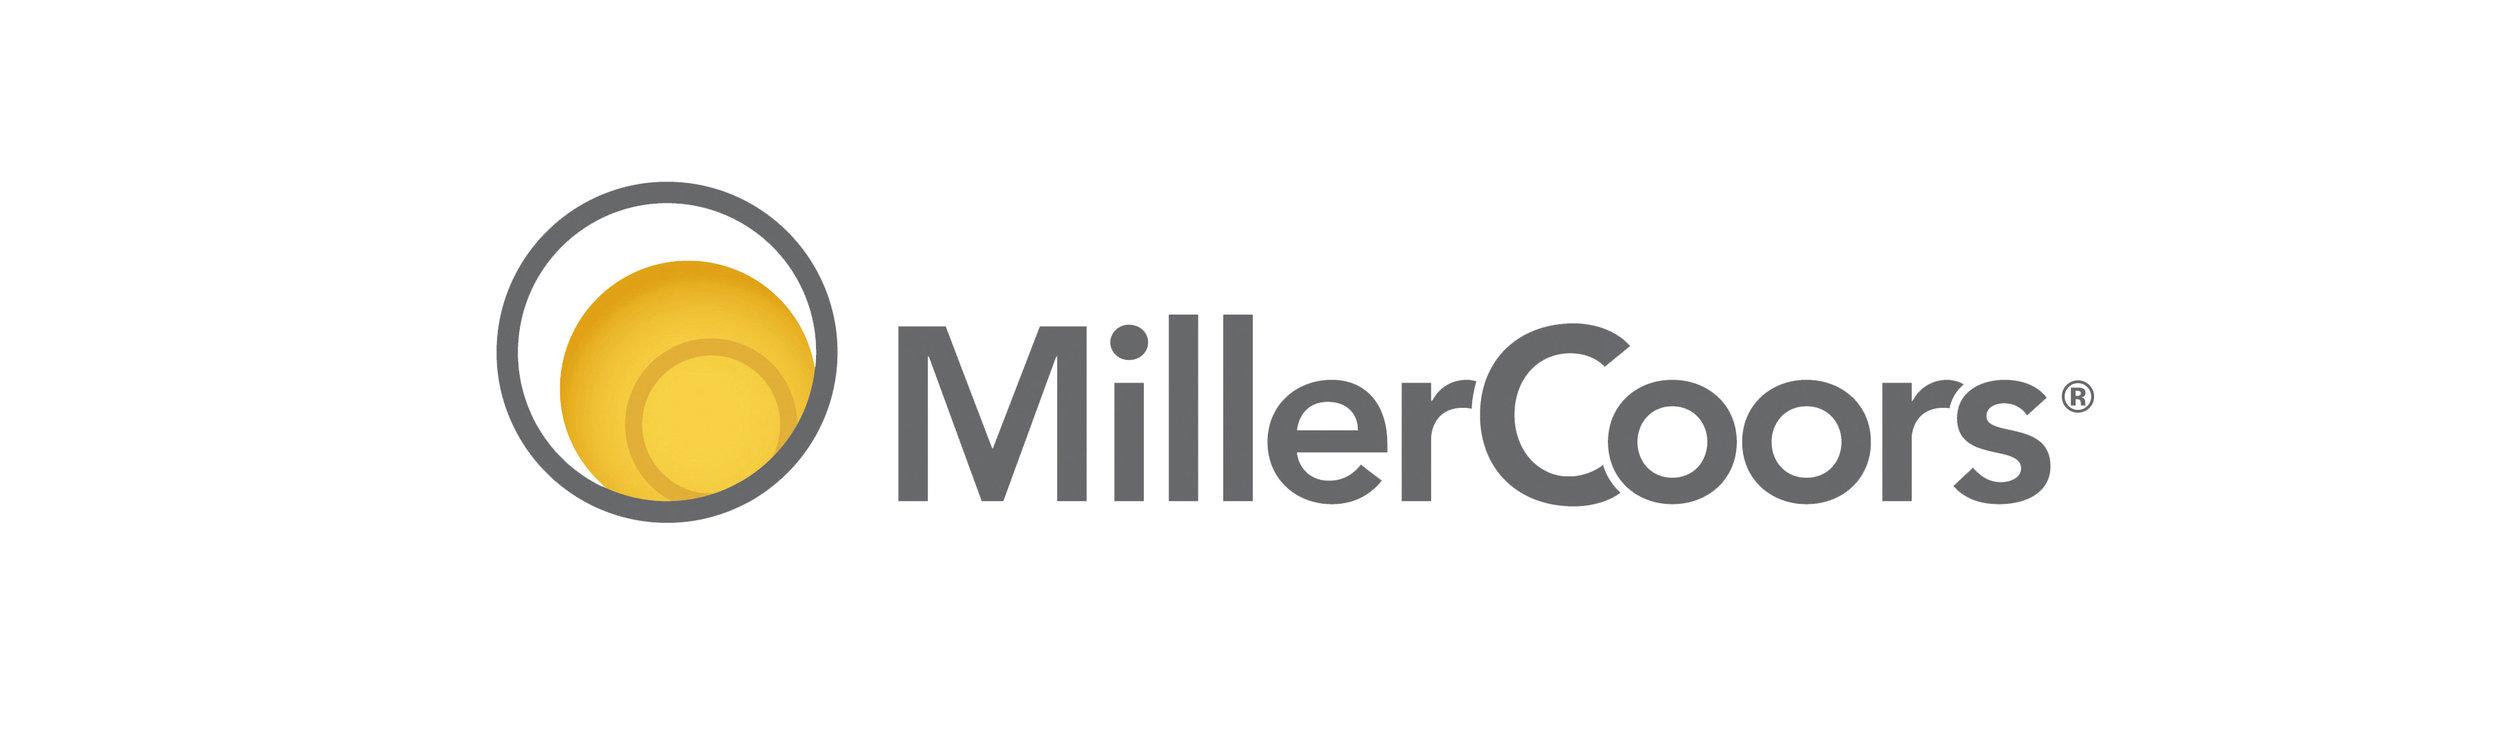 millercoors copy copy.jpg